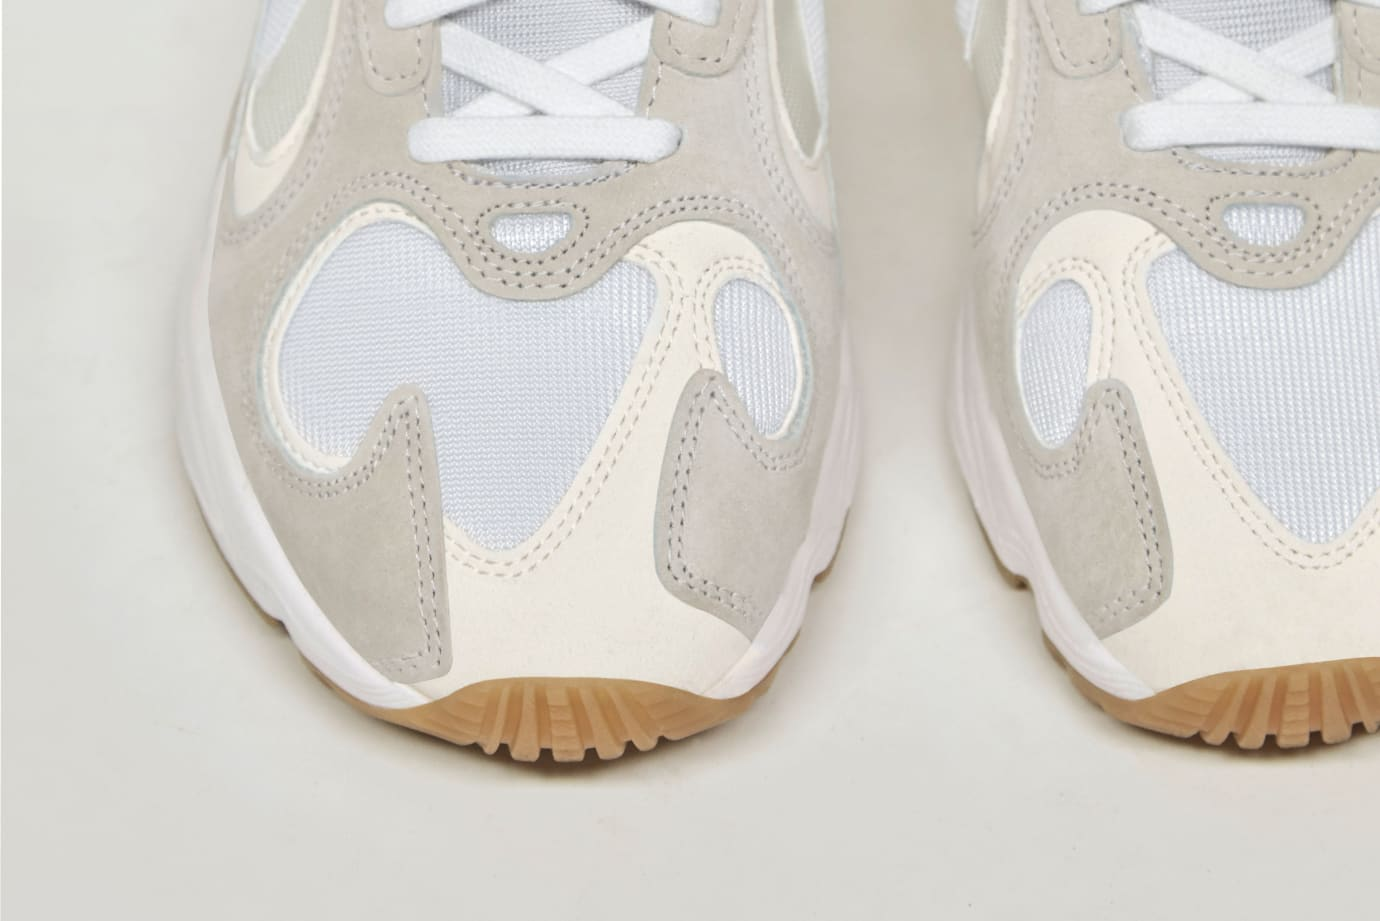 Wardrobe.NYC x Adidas Yung-1 (Toe 2)